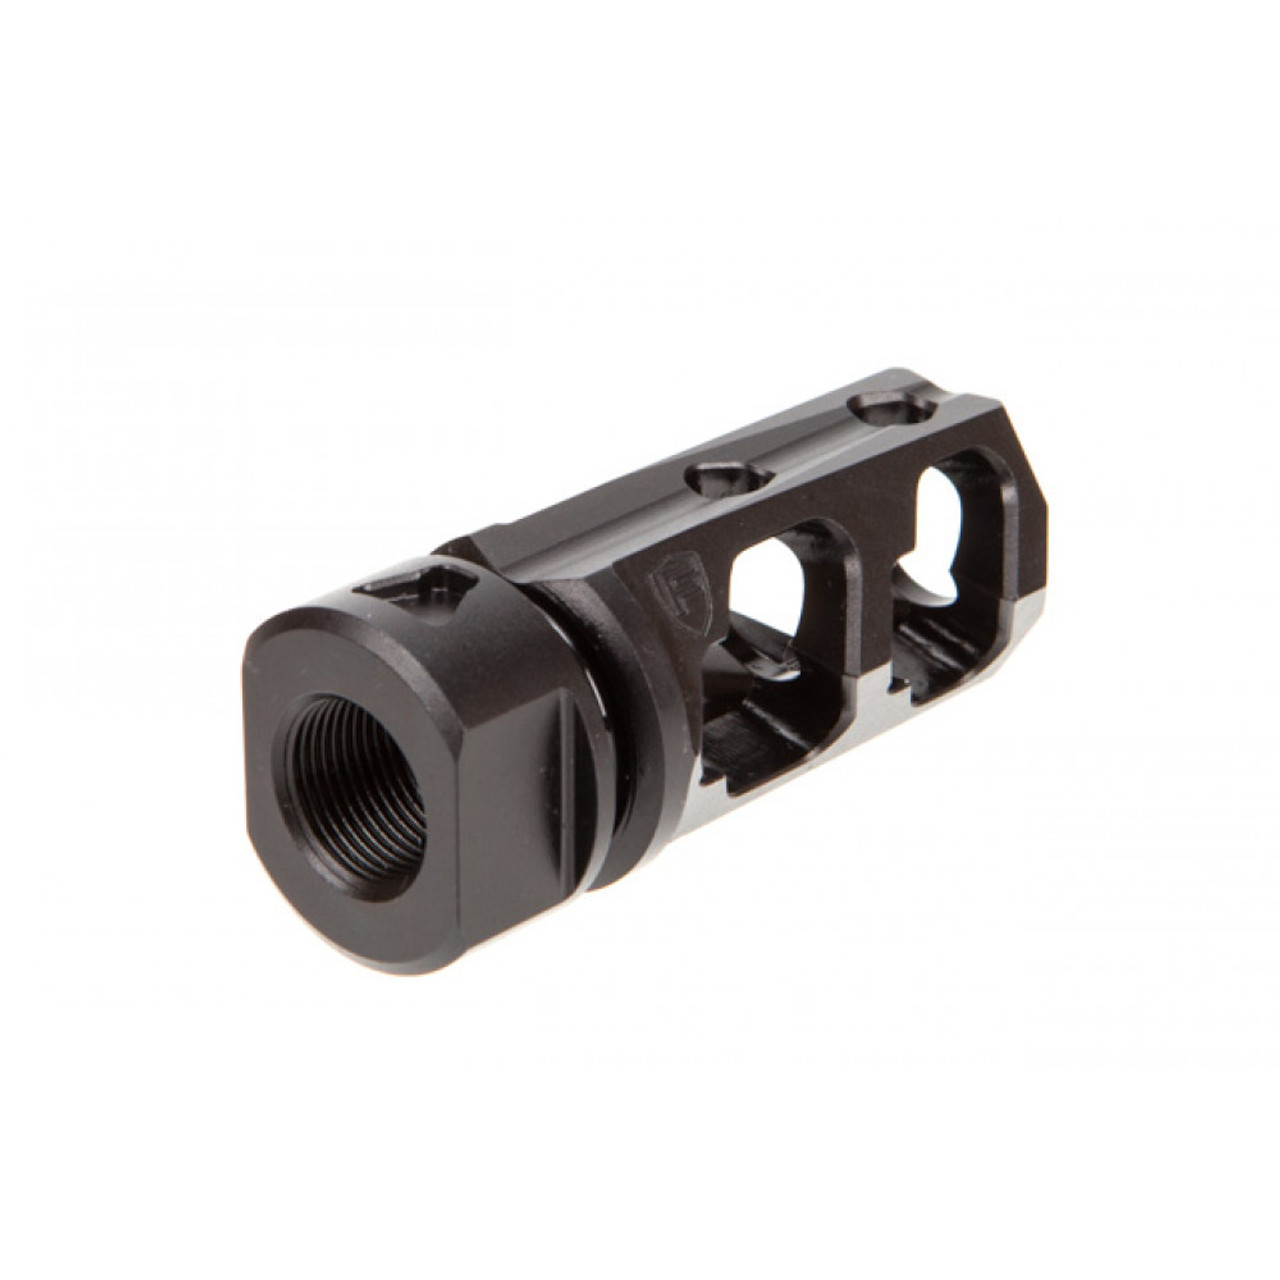 Fortis Muzzle Brake PCC 9MM Nitride - 1/2 x 28 TPI